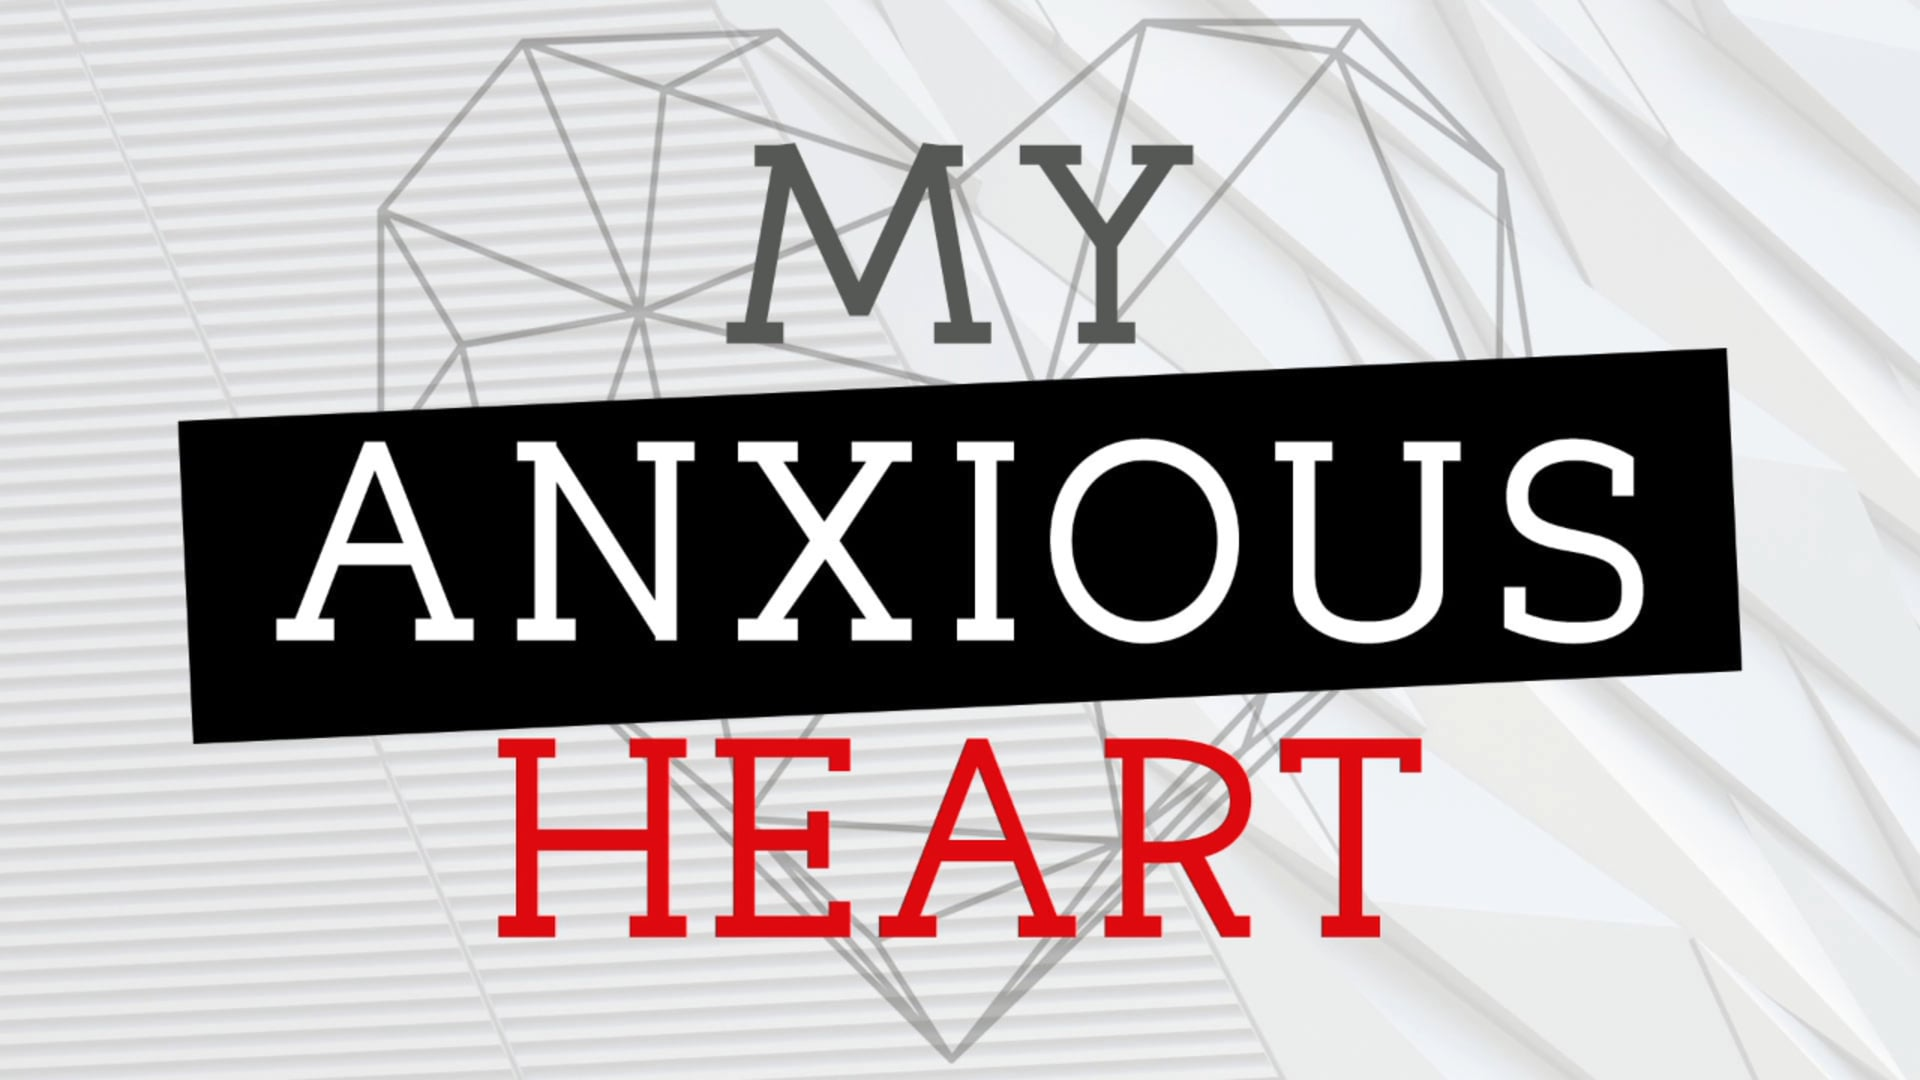 MyAnxiousHeart_1920x1080.jpg